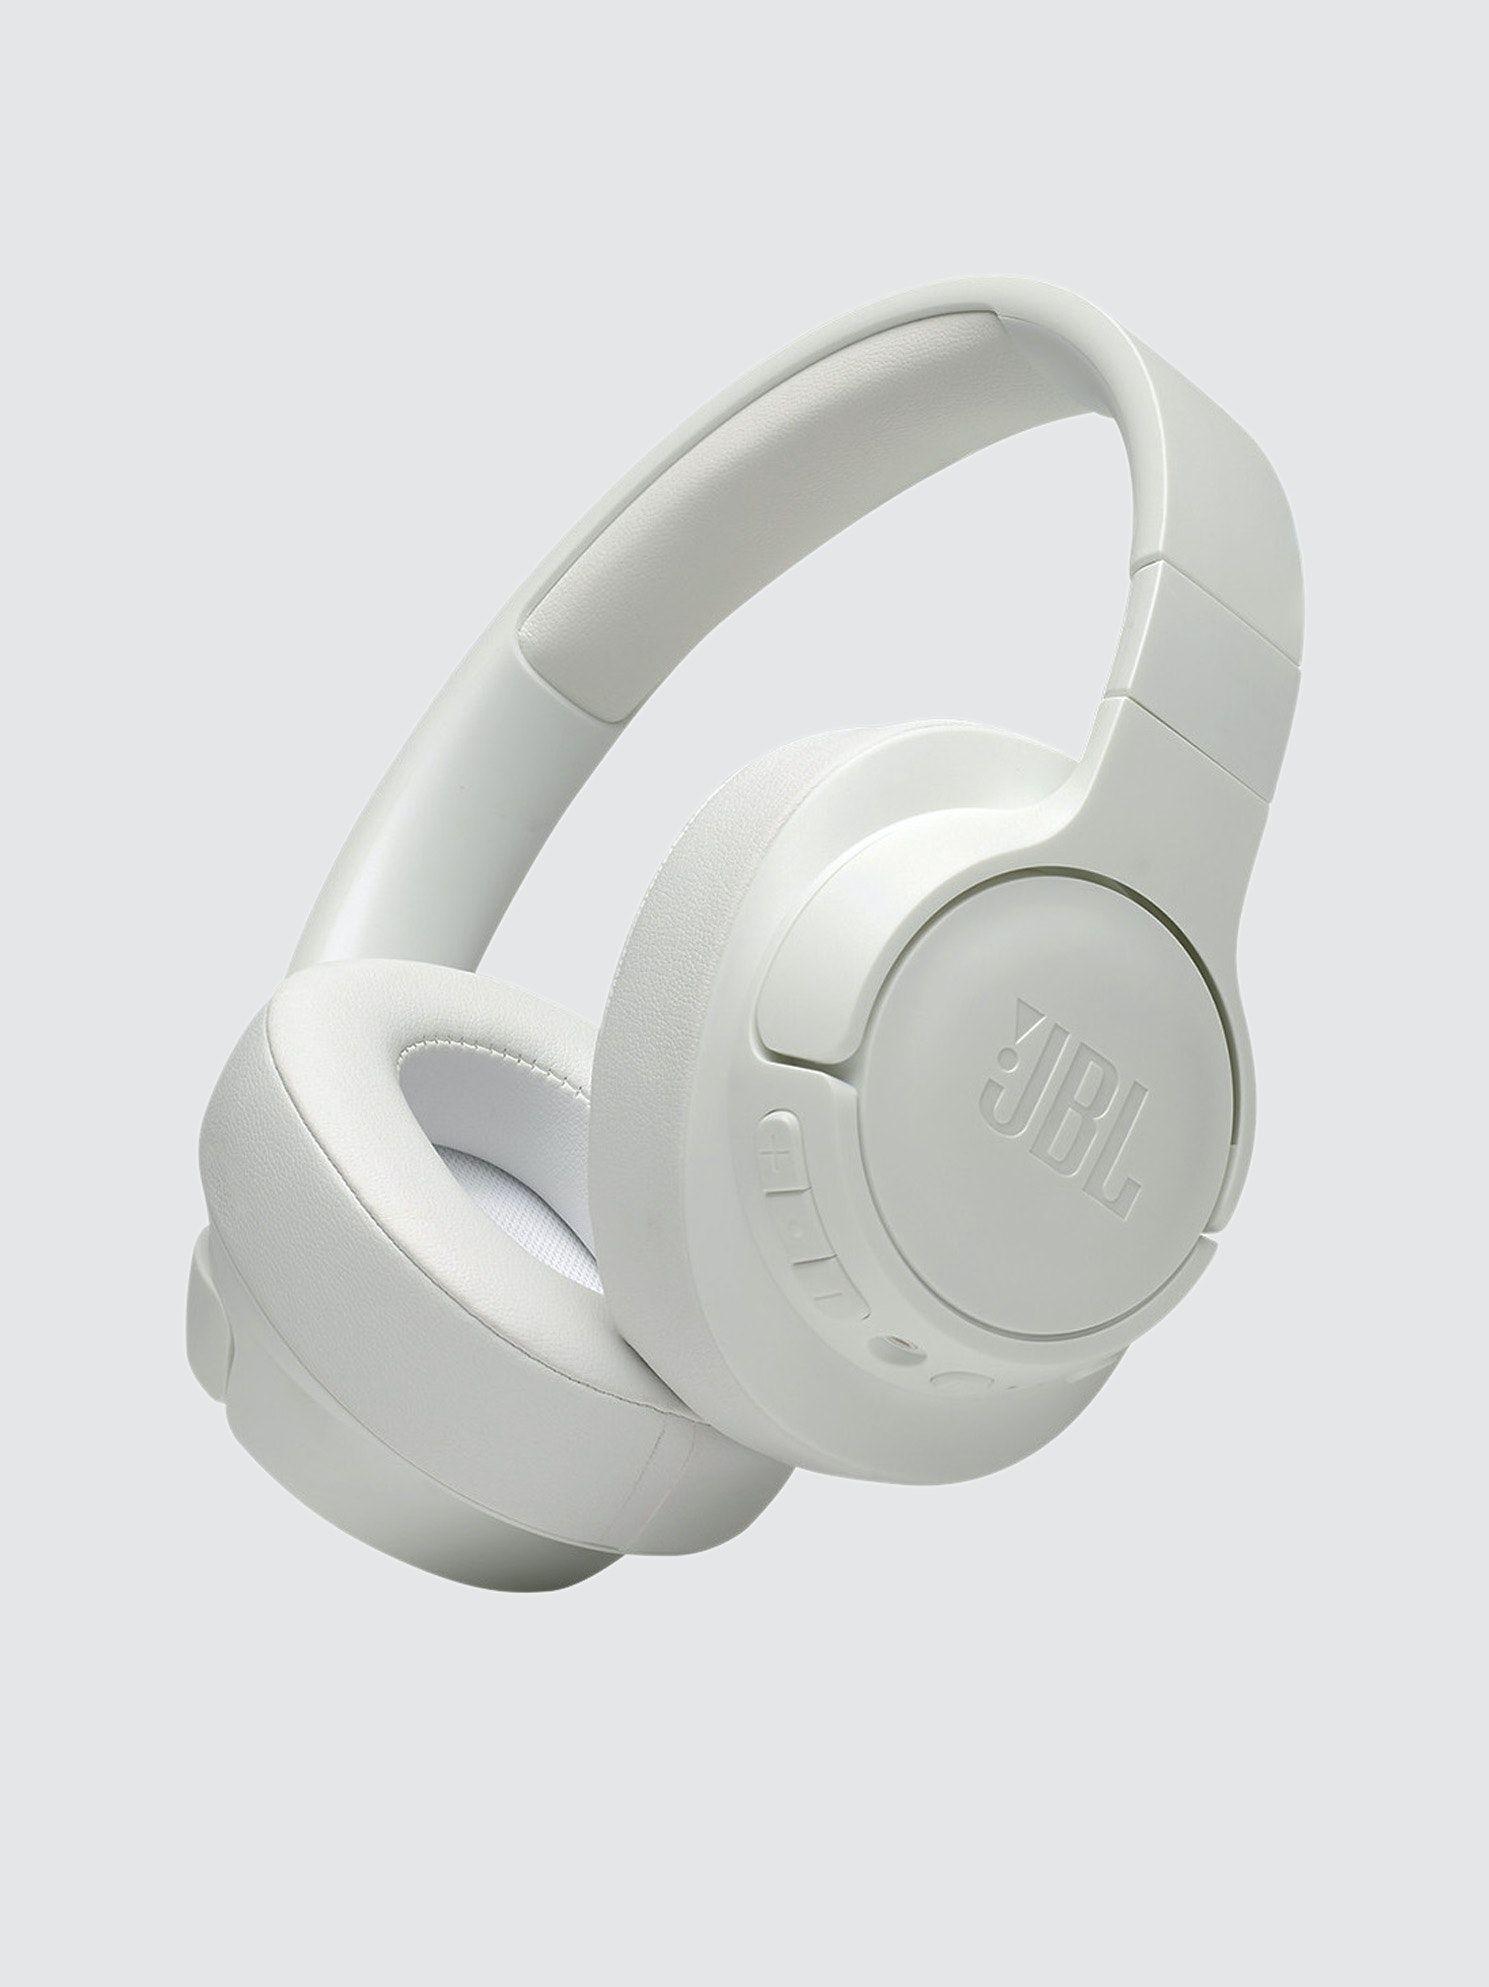 Jbl Tune 750btnc Bluetooth Noise Cancelling Headphones Headphones White Headphones